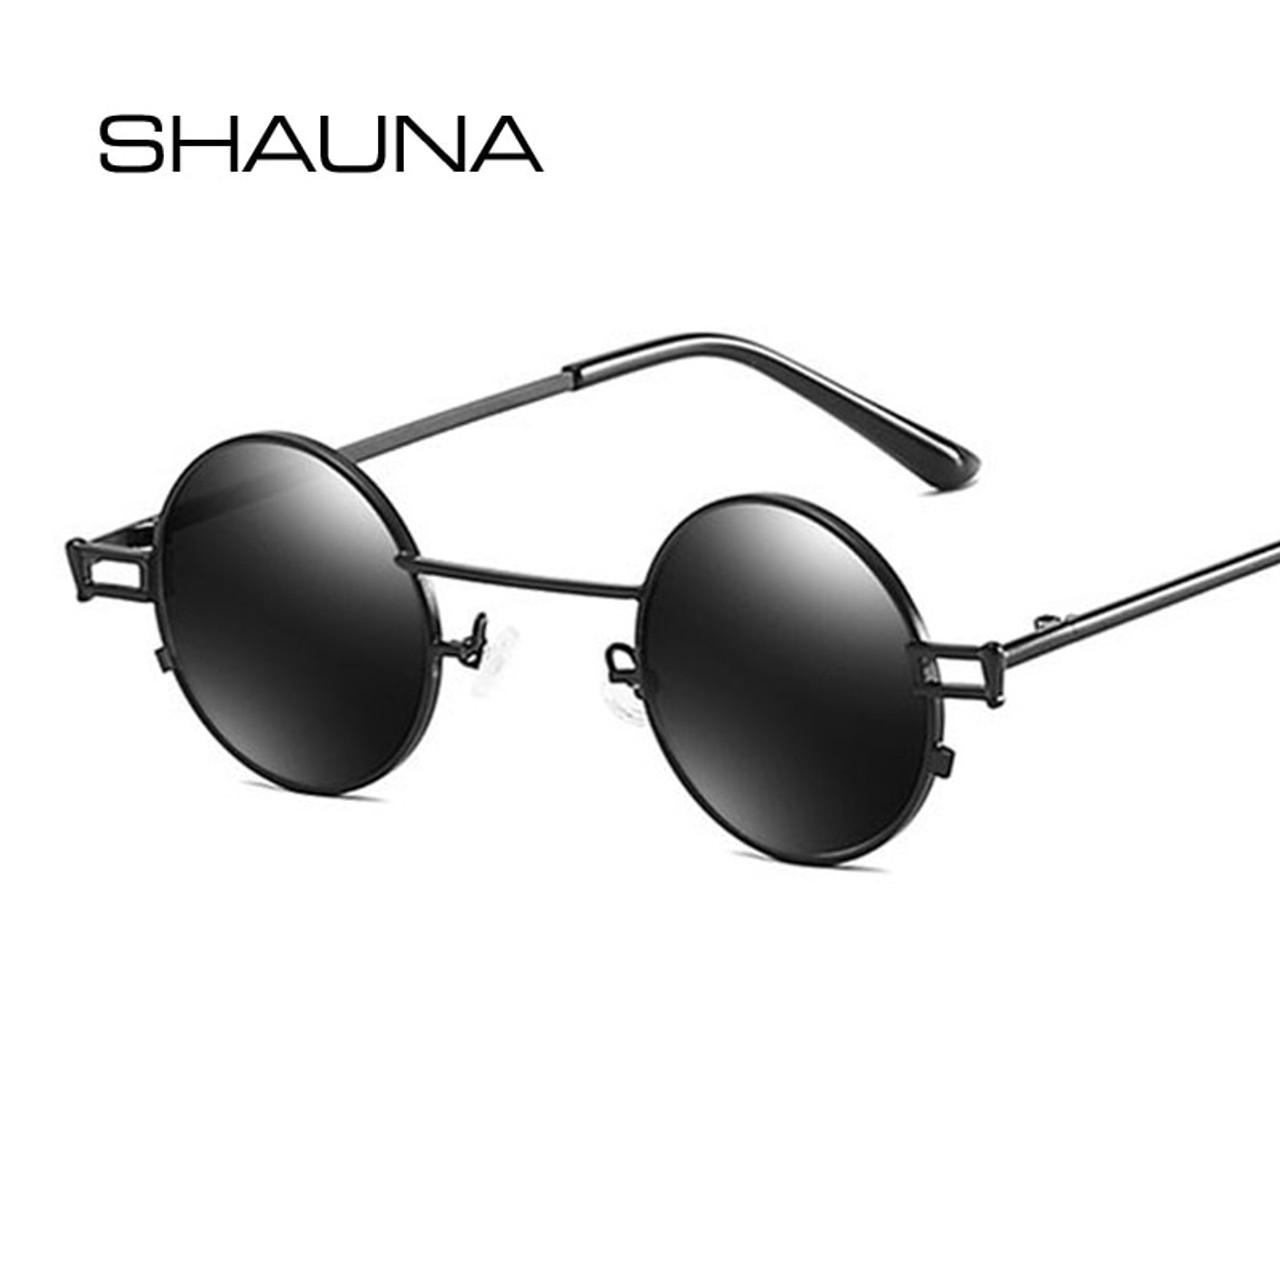 7512908cb1482 ... SHAUNA Retro Small Round Punk Sunglasses Men Vintage Clear Red Tinted  Sun Glasses Women ...